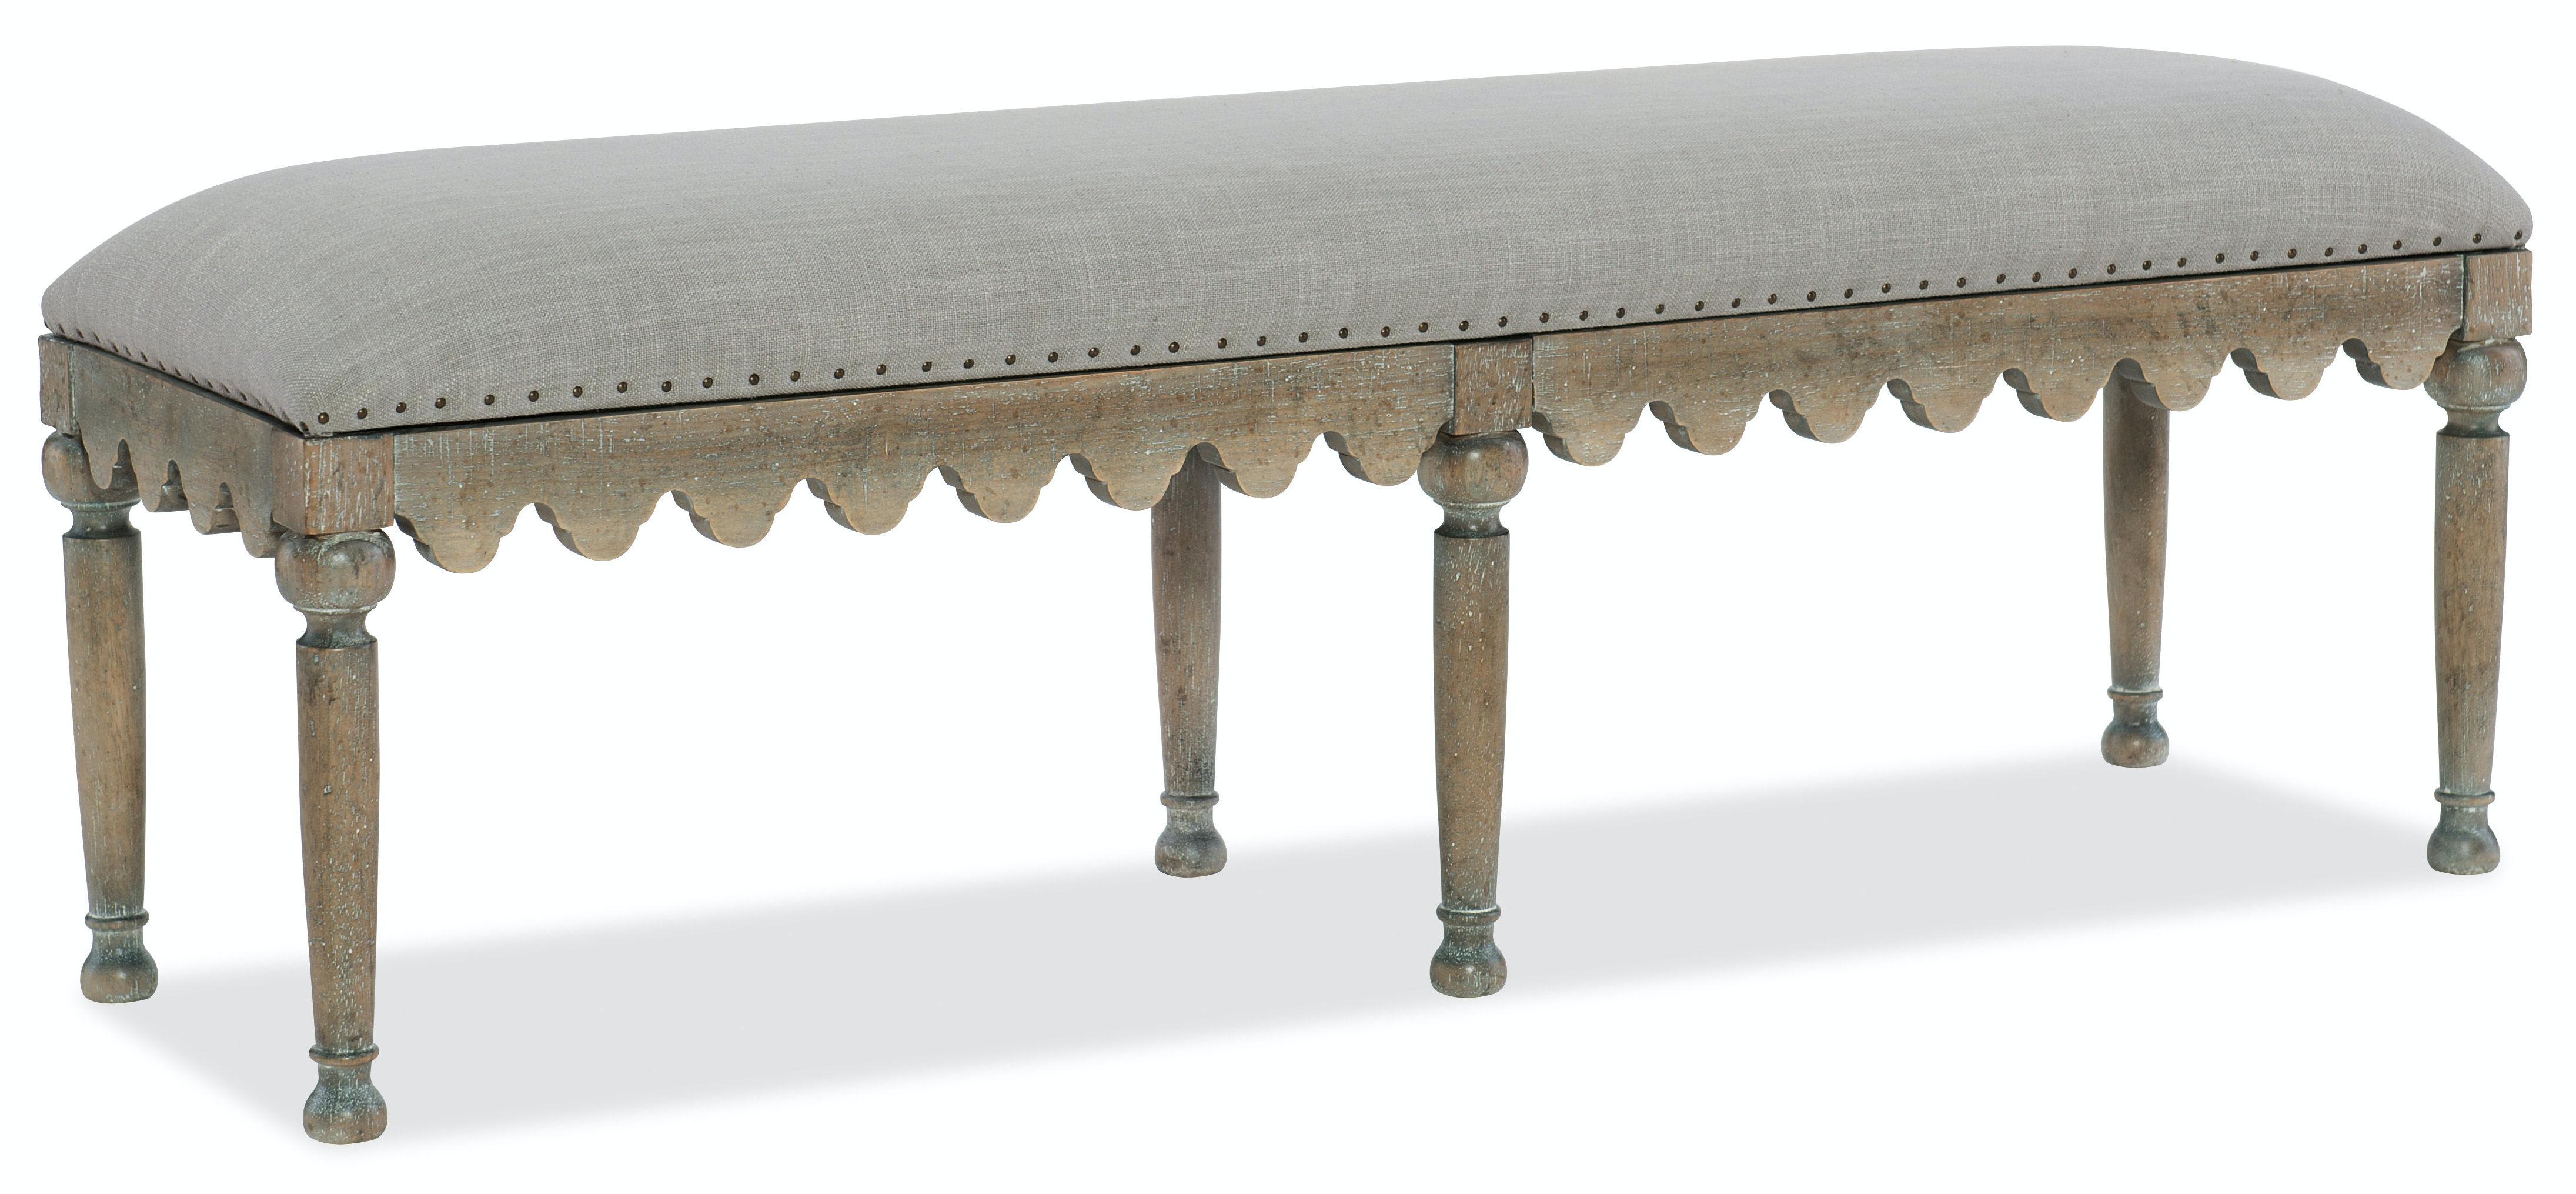 Hooker Furniture Bedroom Boheme Madera Bed Bench 5750-90019-MWD